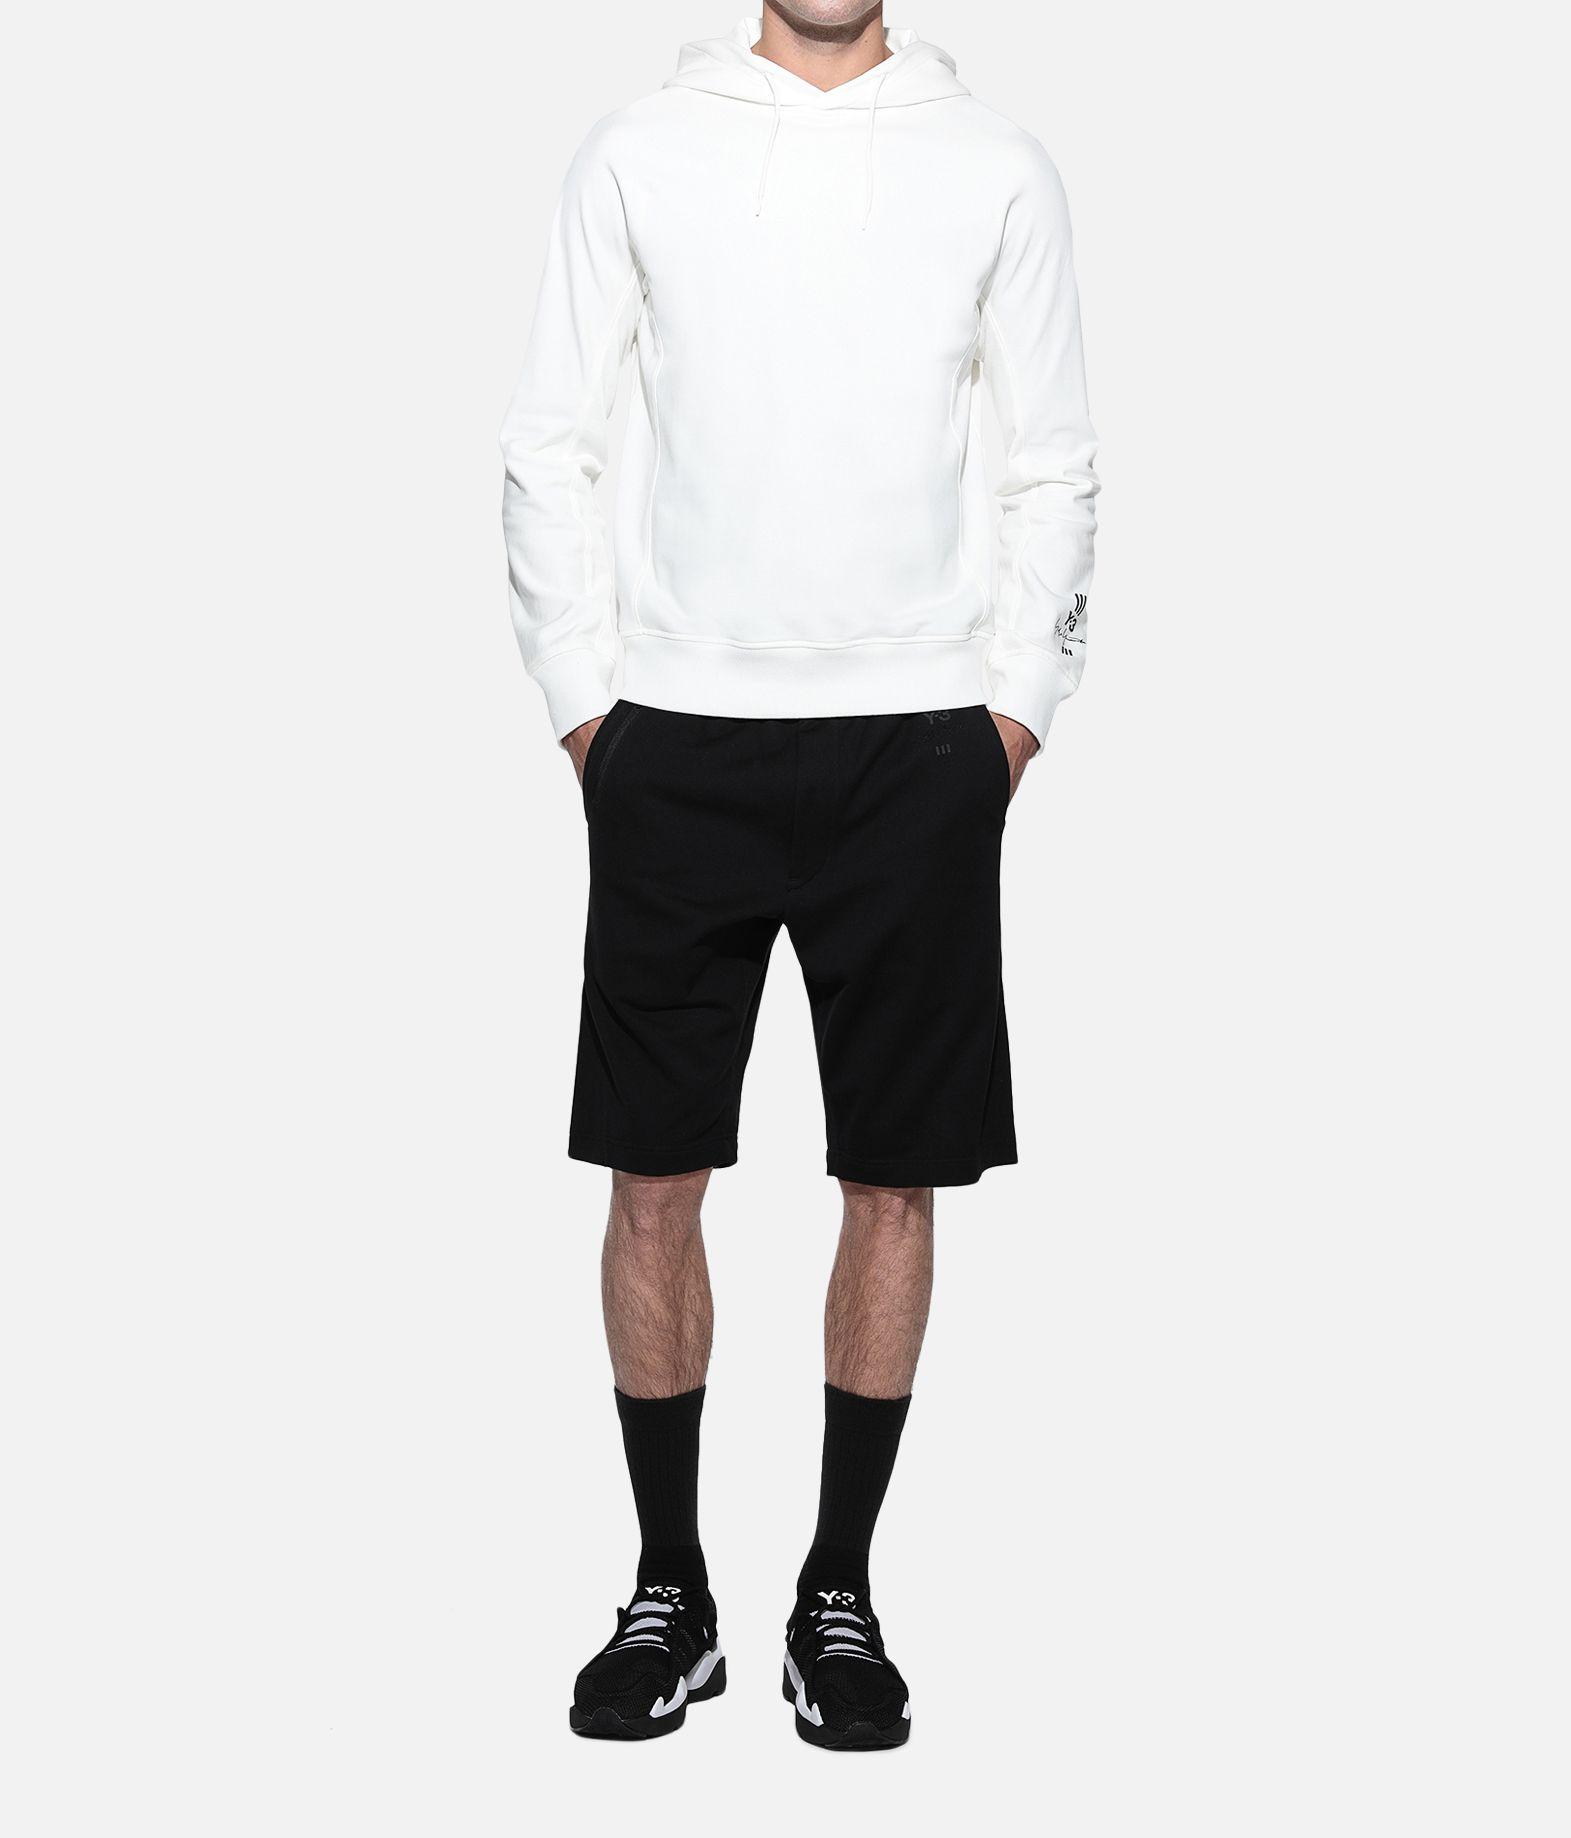 Y-3 Y-3 Classic Hoodie Sweatshirt mit Kapuze Herren a